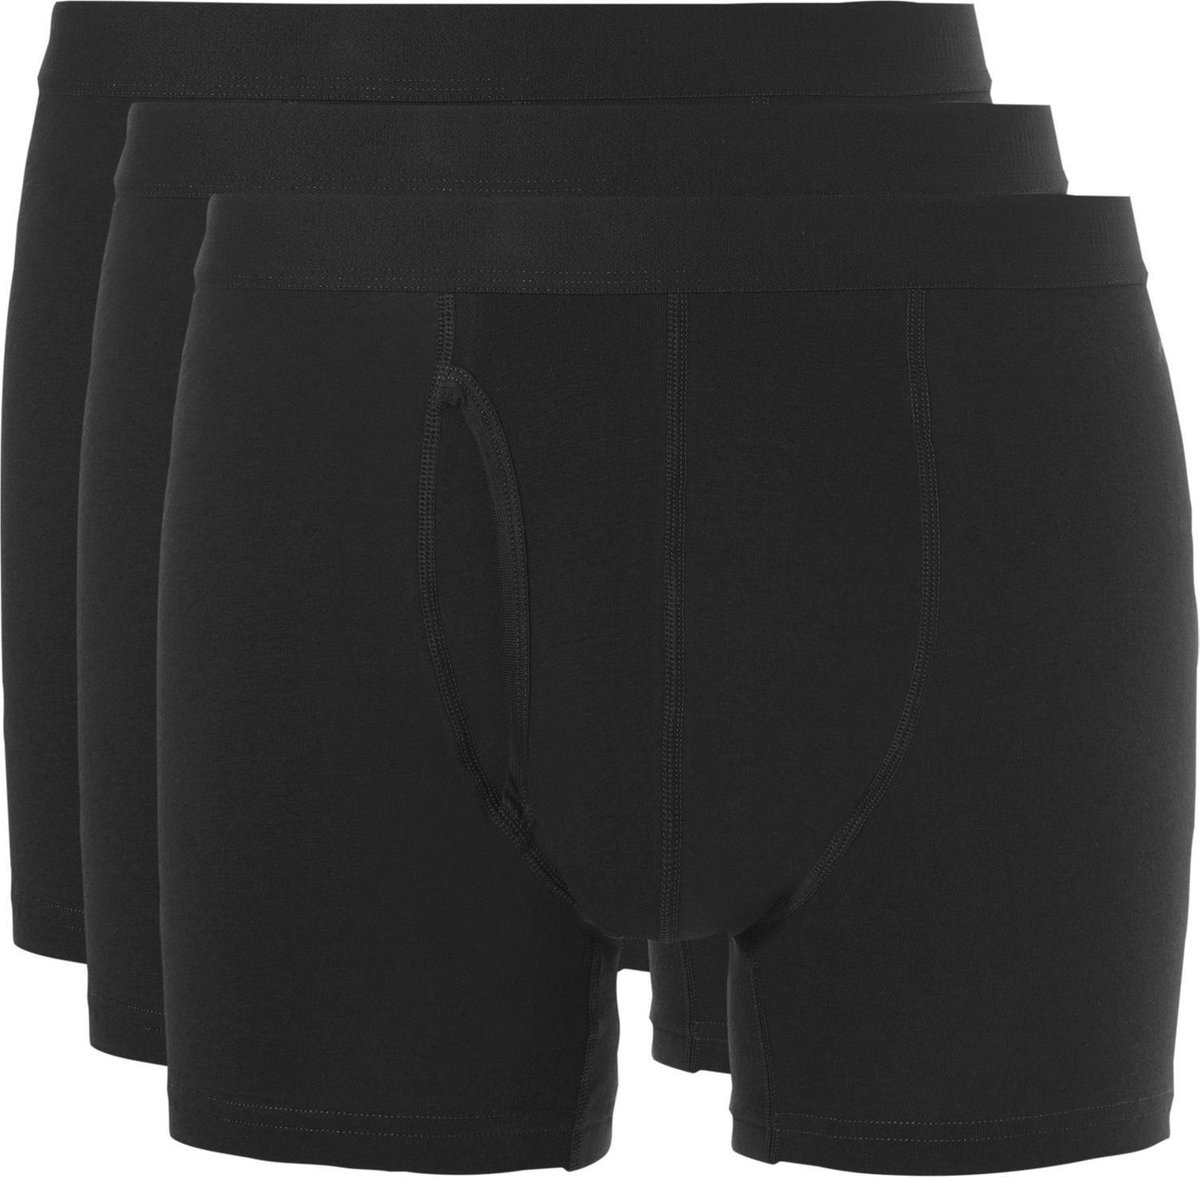 Ten Cate Boxer 3Pack Basic Zwart - Maat L